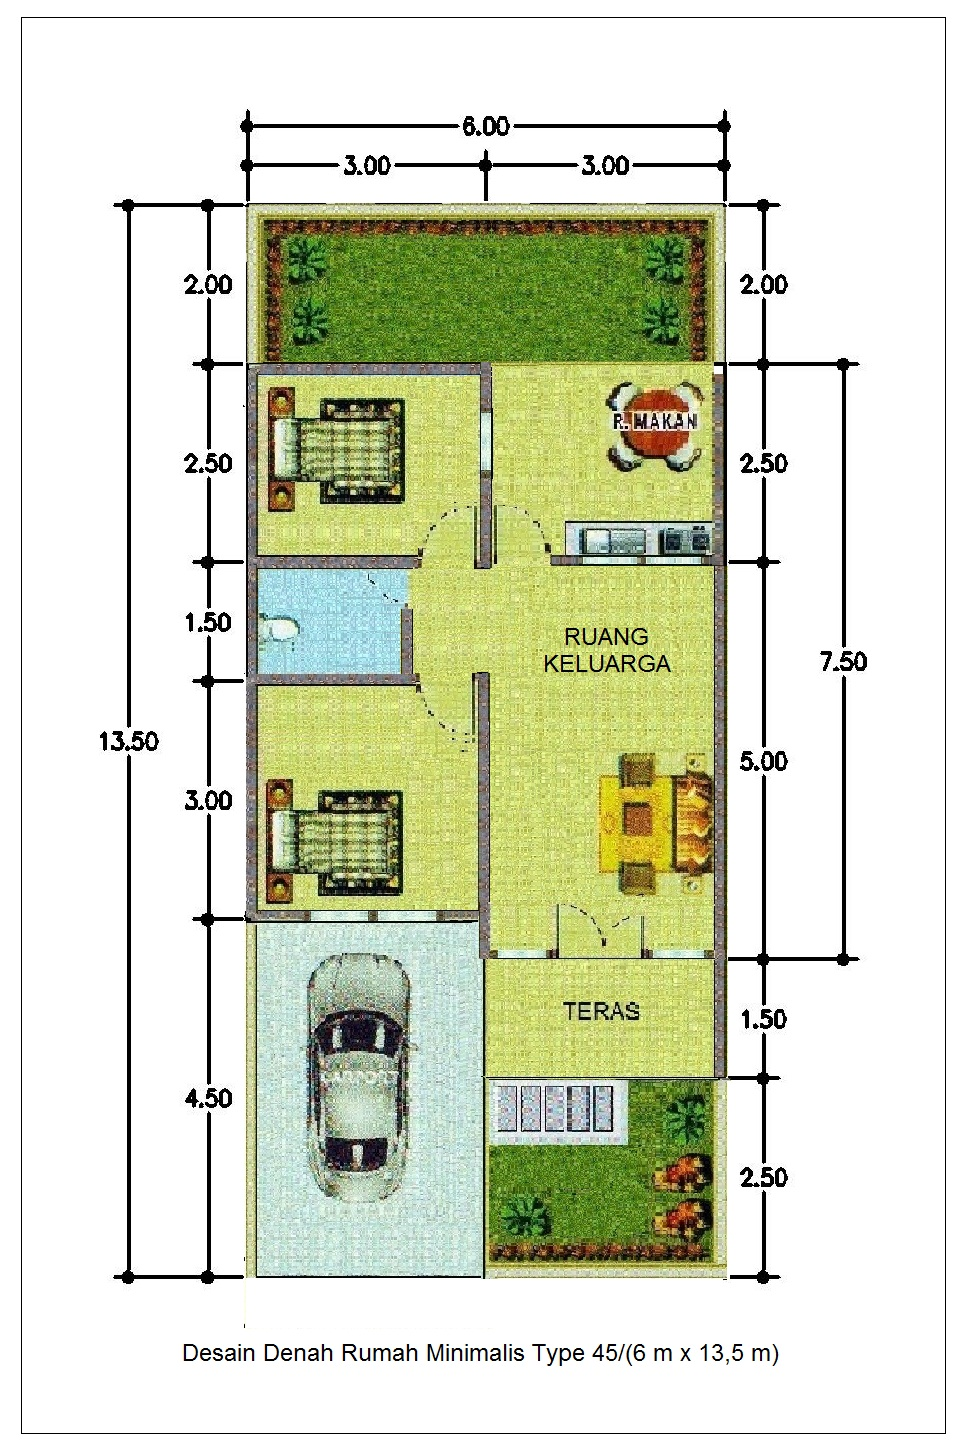 10 desain denah rumah minimalis modern 2 lantai type 45 - Desain Denah Rumah Minimalis Type 45 6m X 13 5m